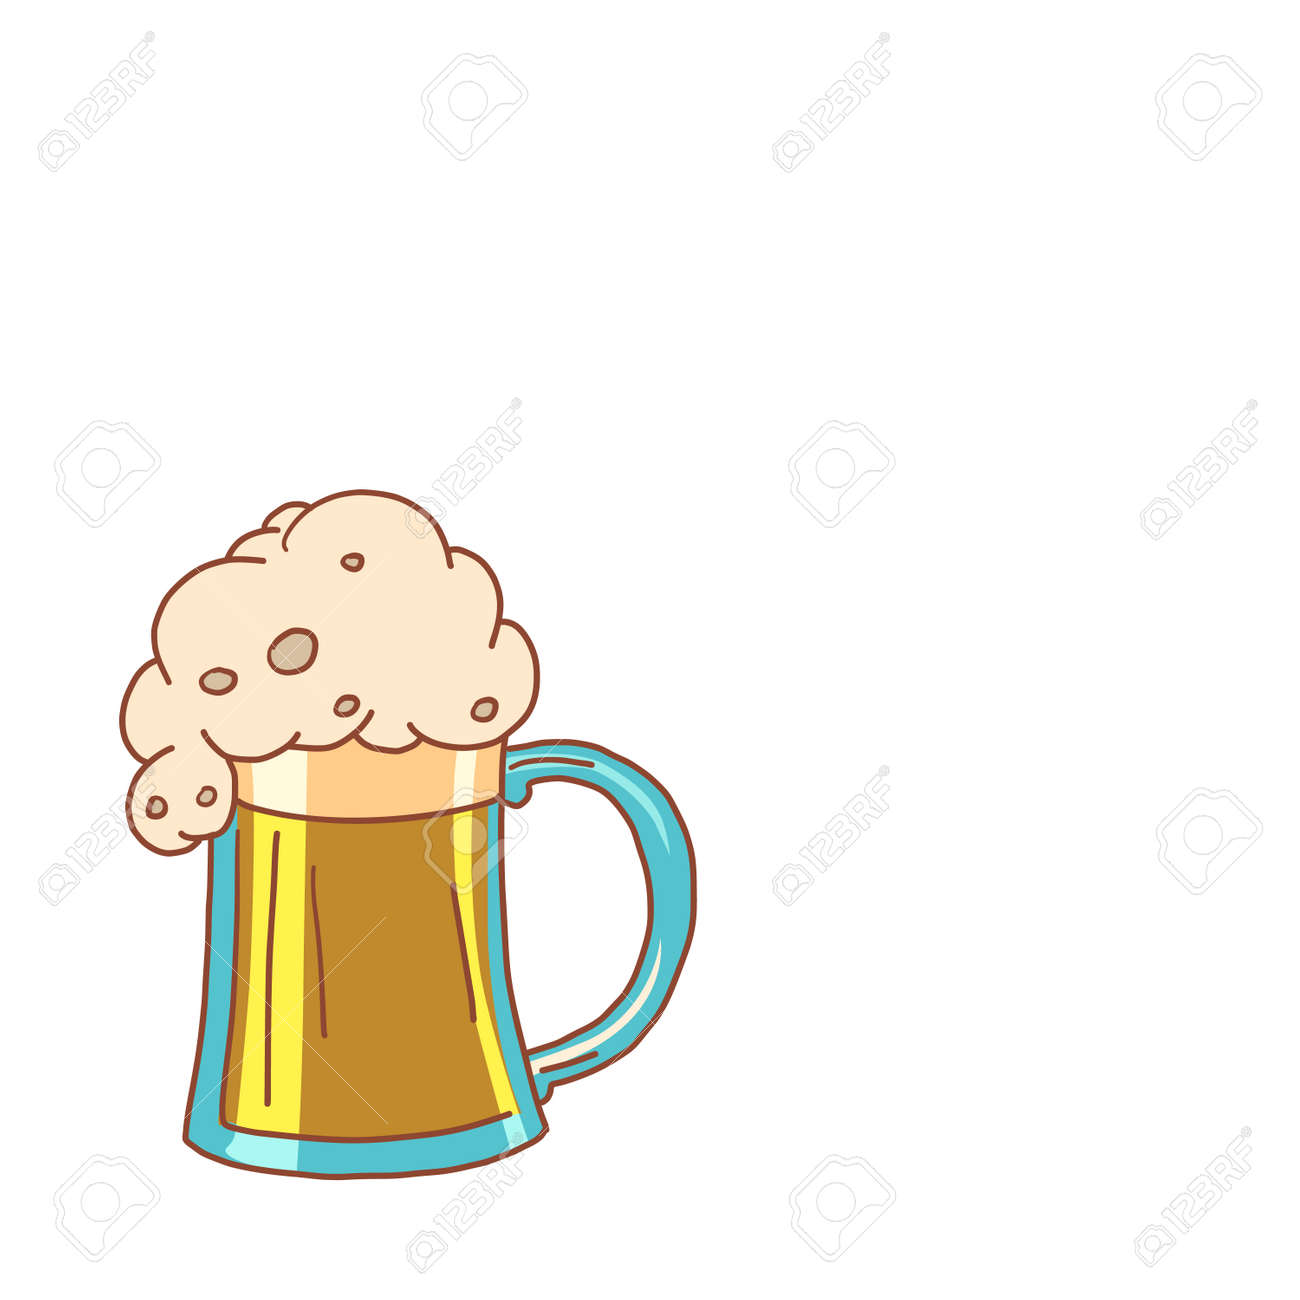 Foam Beer In A Mug Comic Cartoon Pore Art Retro Vector Kitsch Royalty Free Cliparts Vectors And Stock Illustration Image 141780515